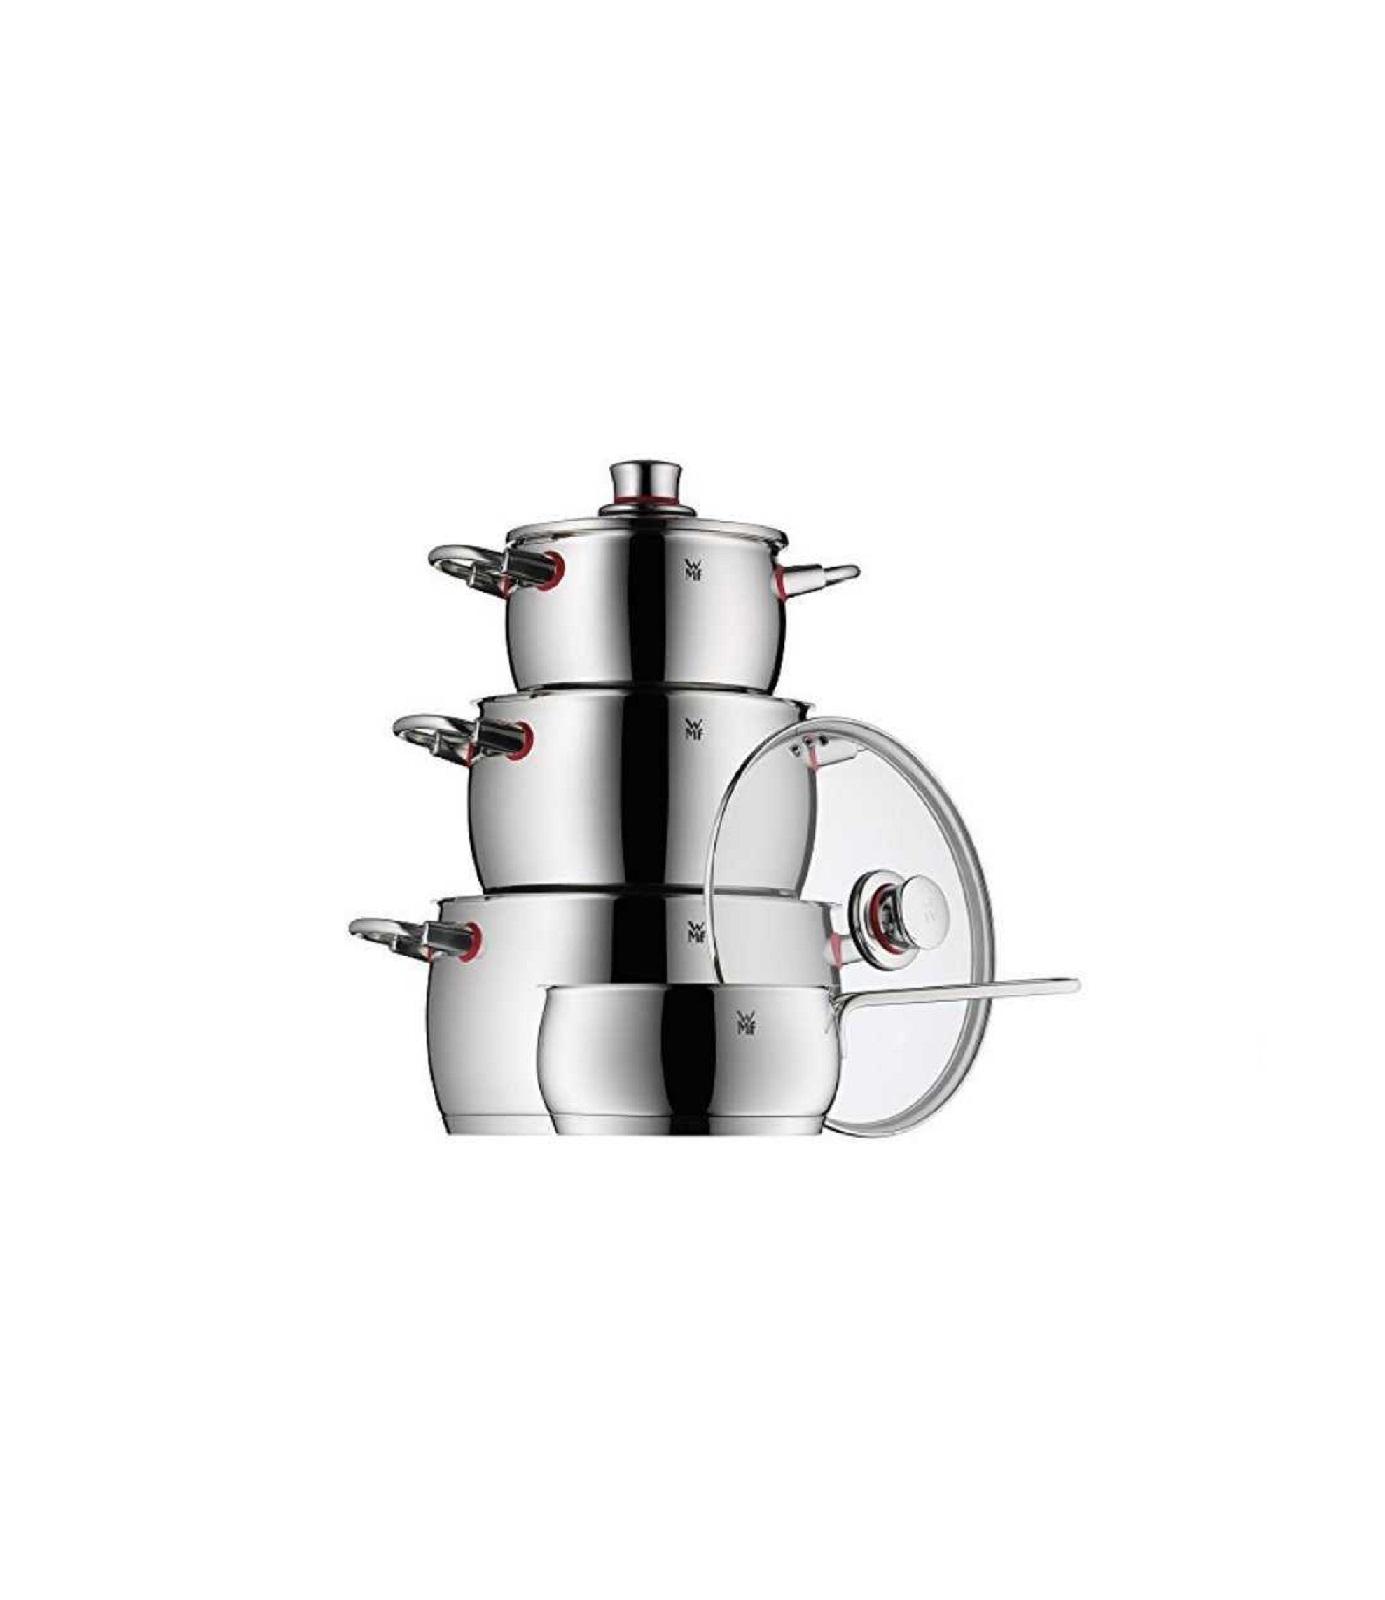 Набор кухонной посуды WMF QUALITY ONE серебристый,, 4 предмета WMF 07 7414 6380 sp фото 1